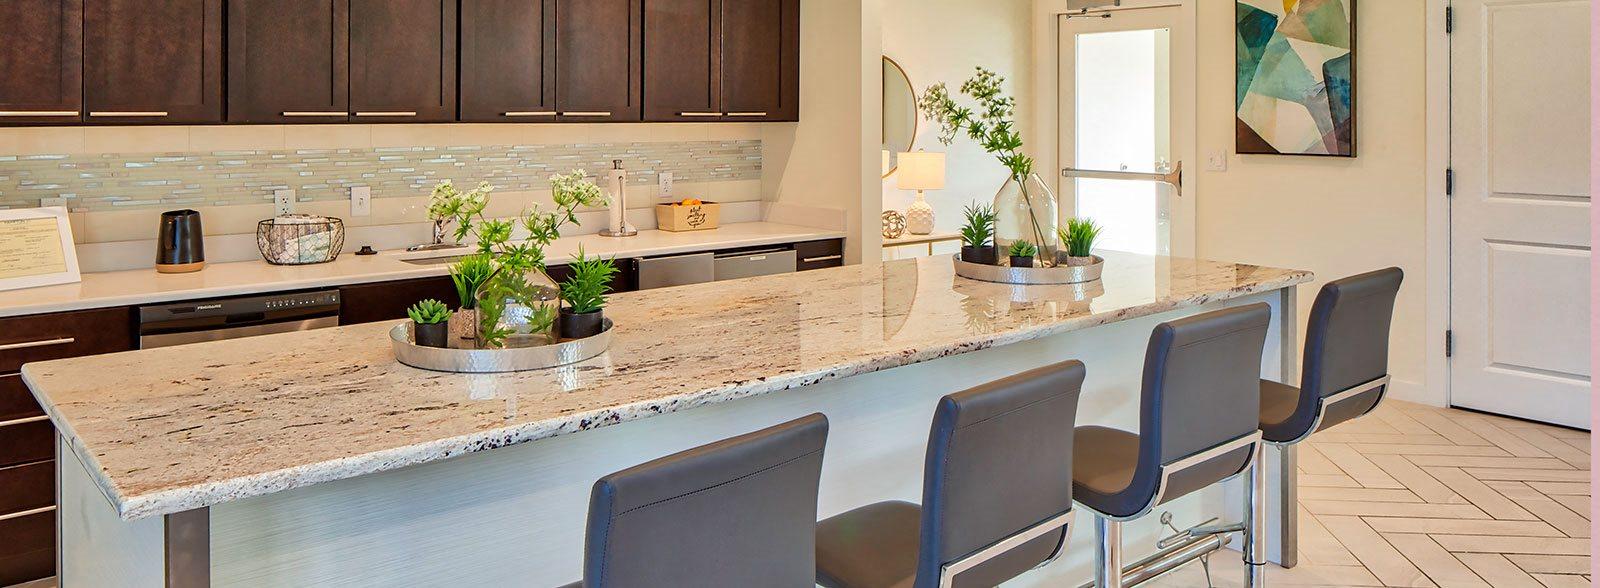 Fantastic Buckroe Pointe Apartments In Hampton Va Interior Design Ideas Jittwwsoteloinfo